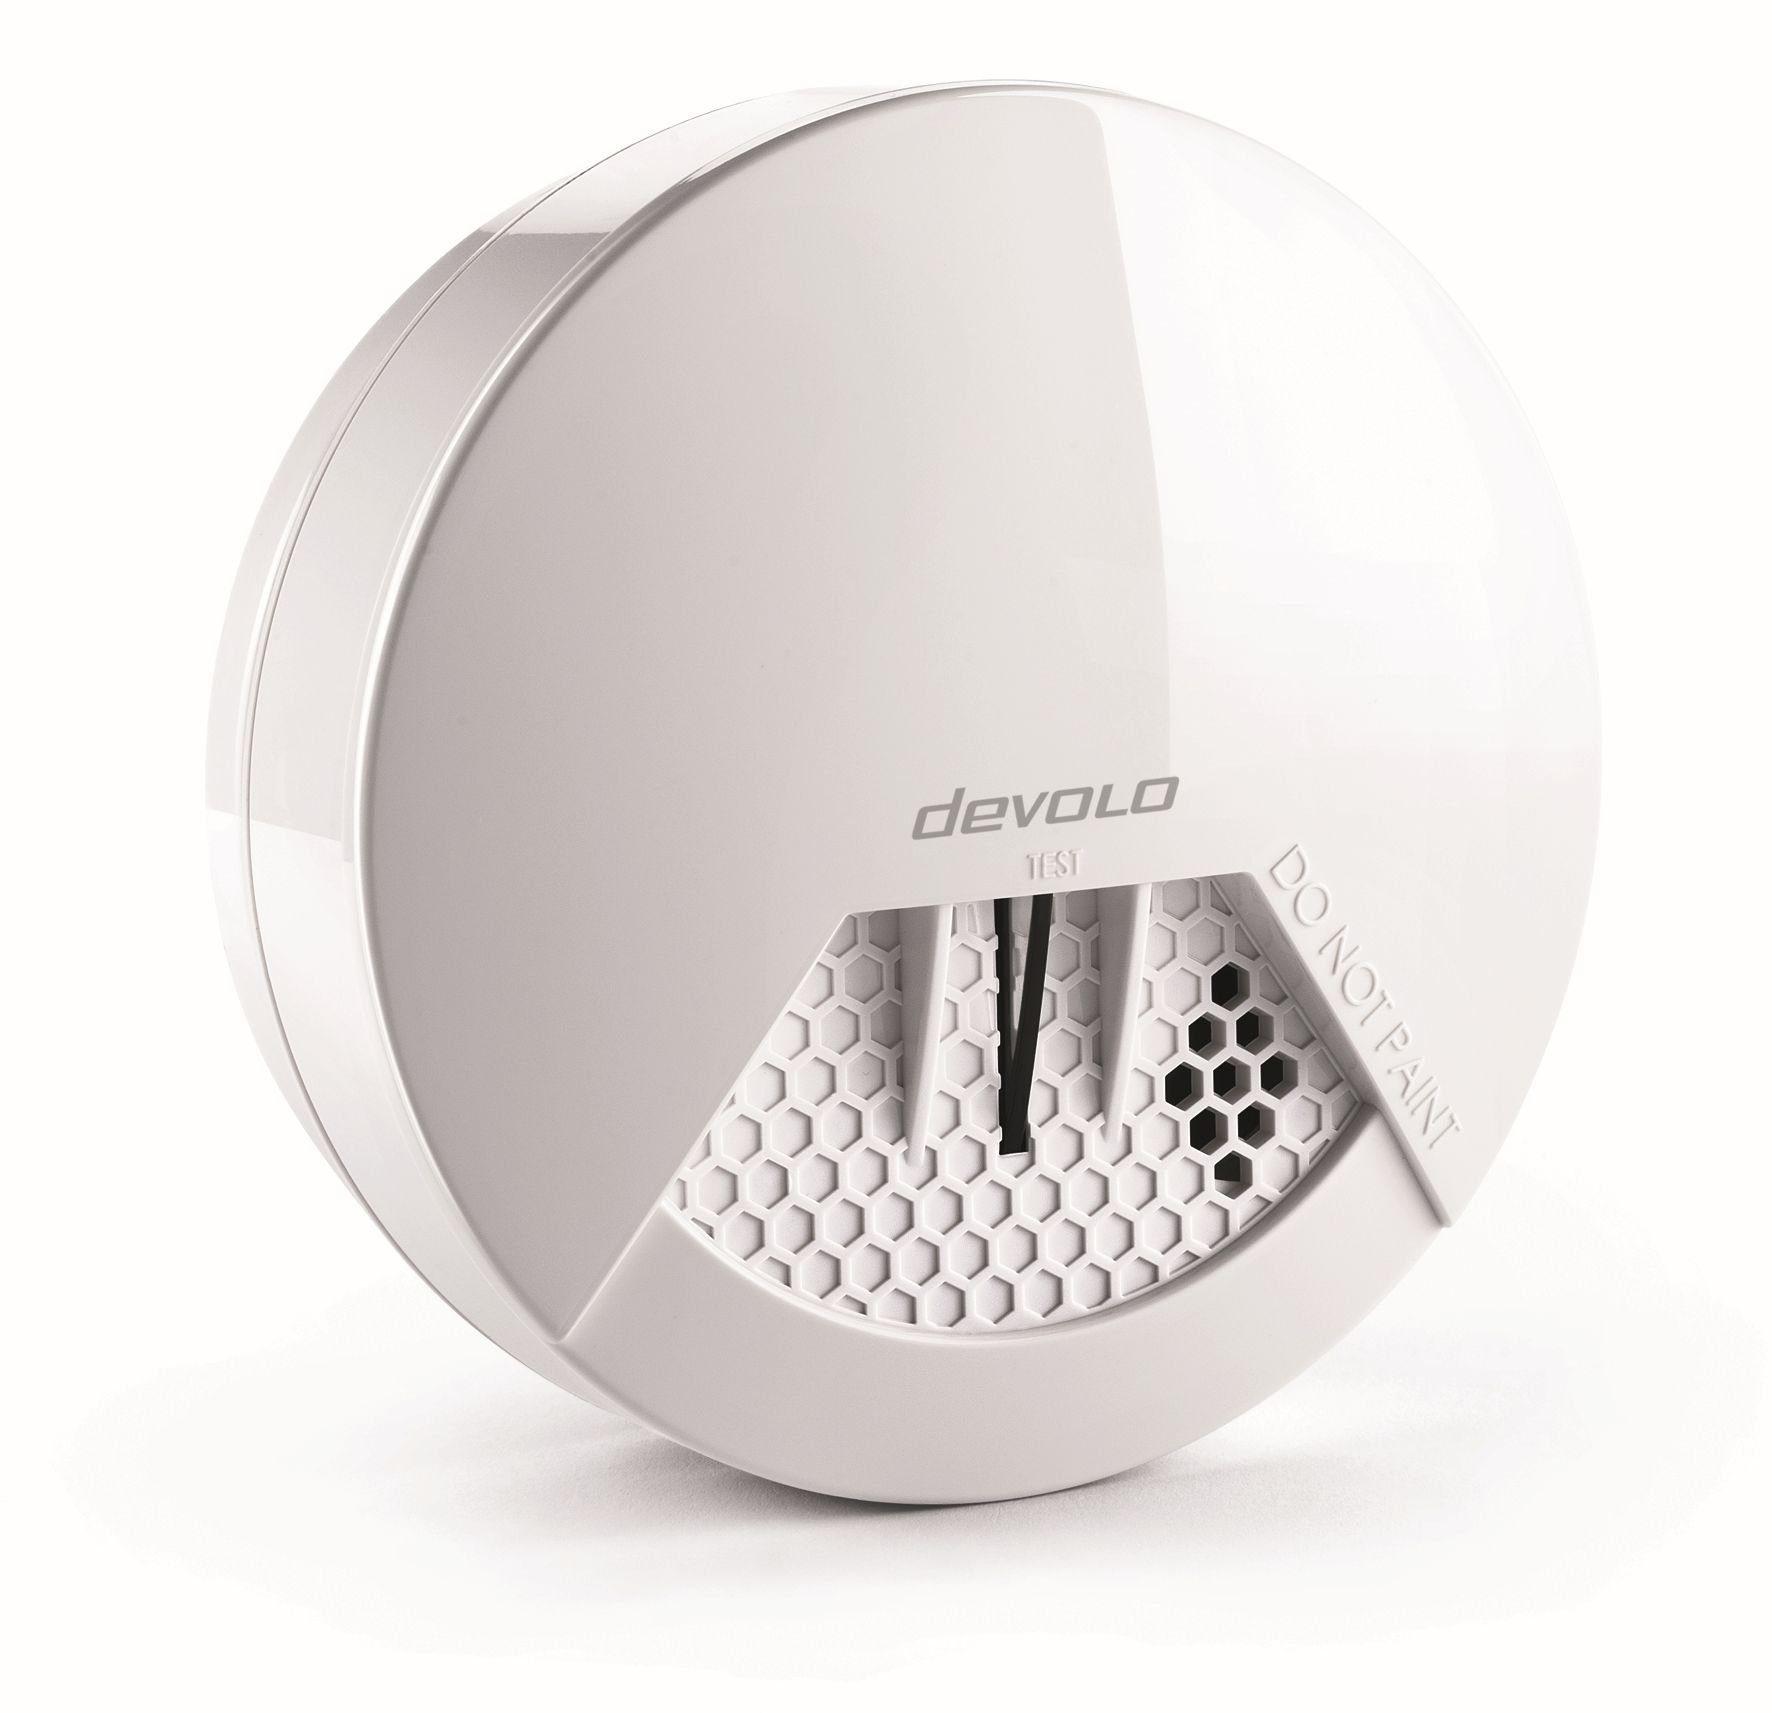 DEVOLO Smart Home Z-Wave »Home Control Rauchmelder, Sirene, DIN14604, Alarm«